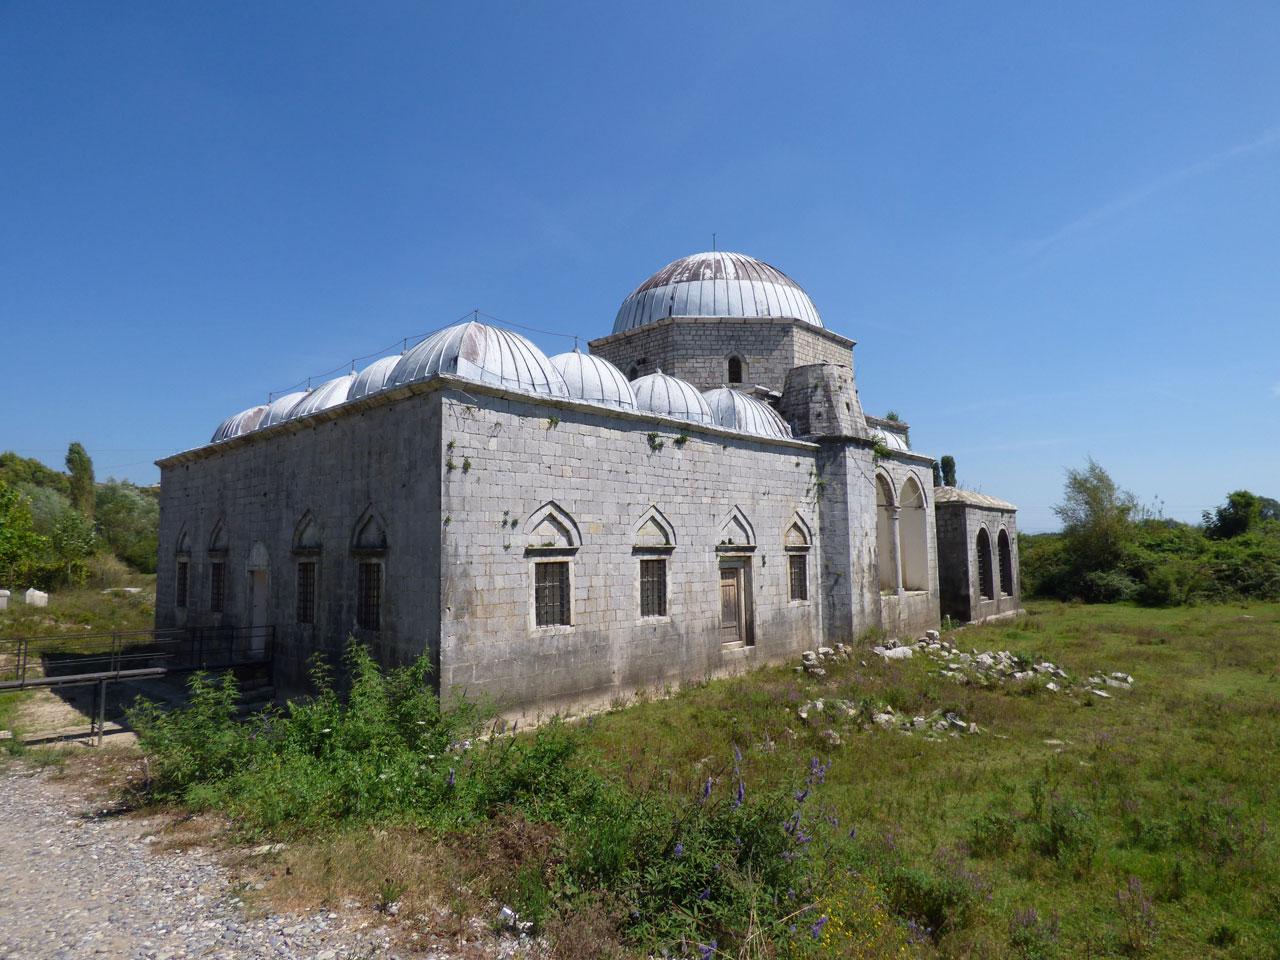 The Lead Mosque, Shkodër, Albania